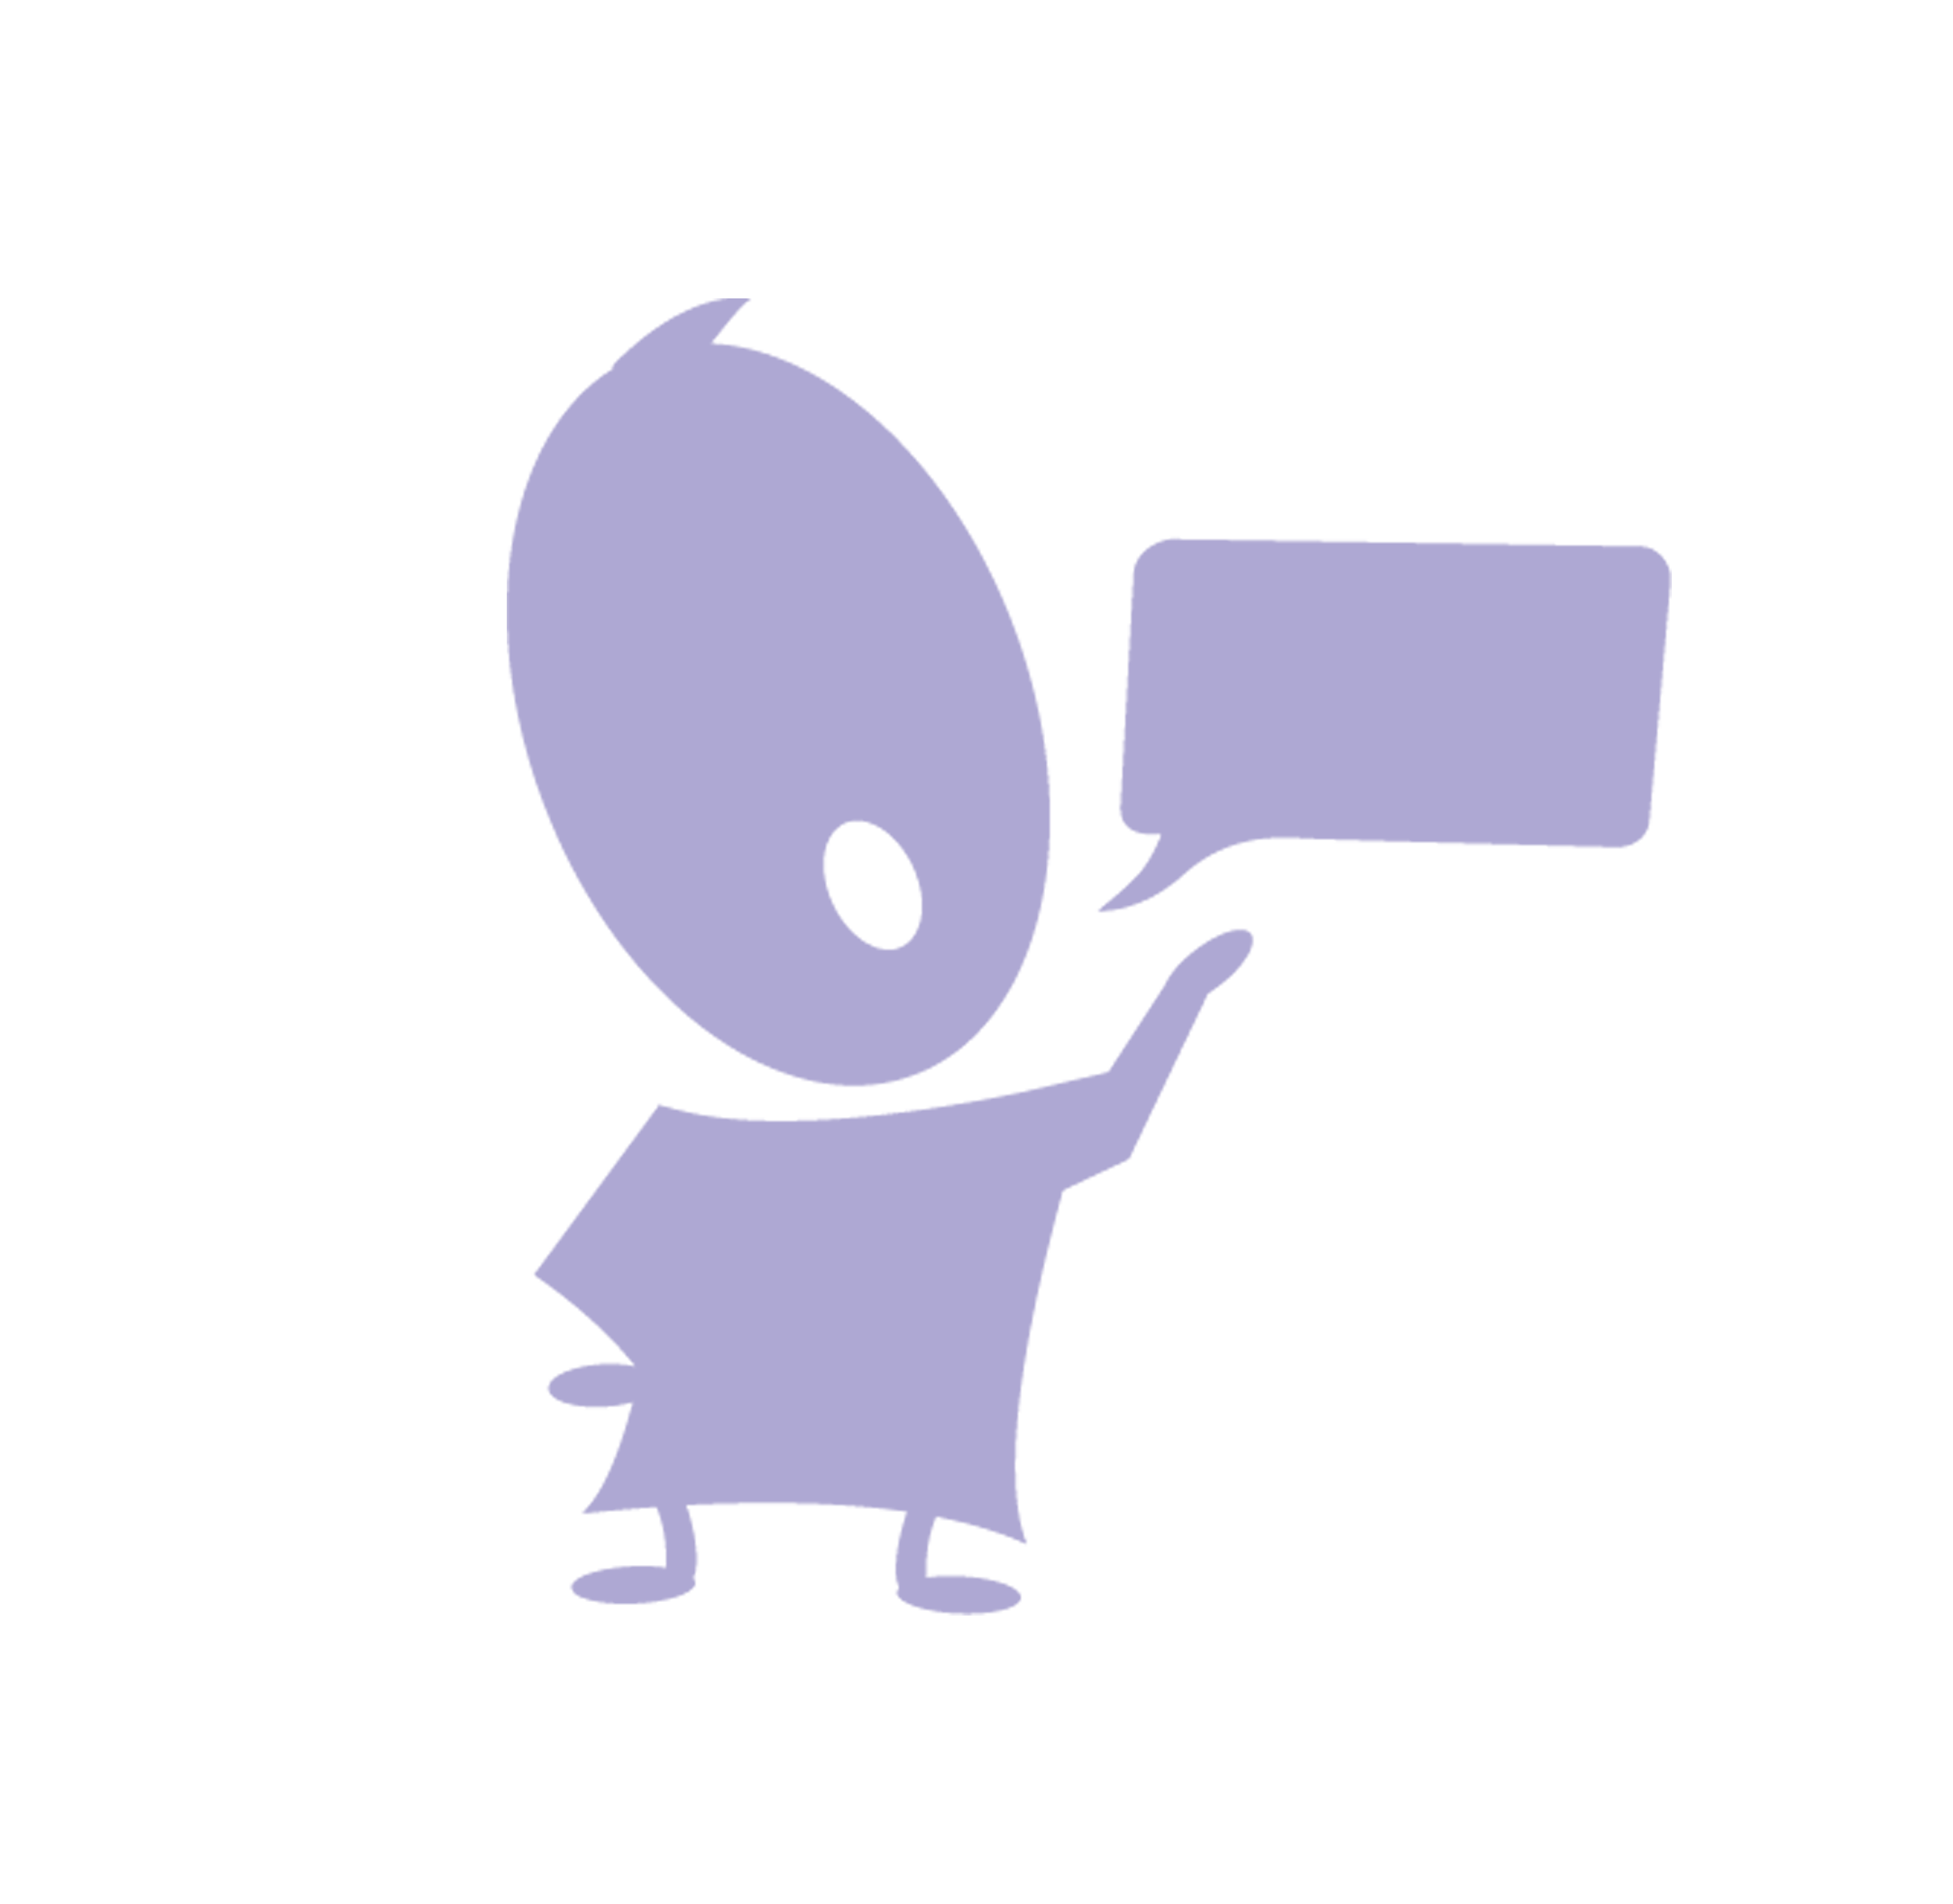 toys for speech. Trust clipart articulation